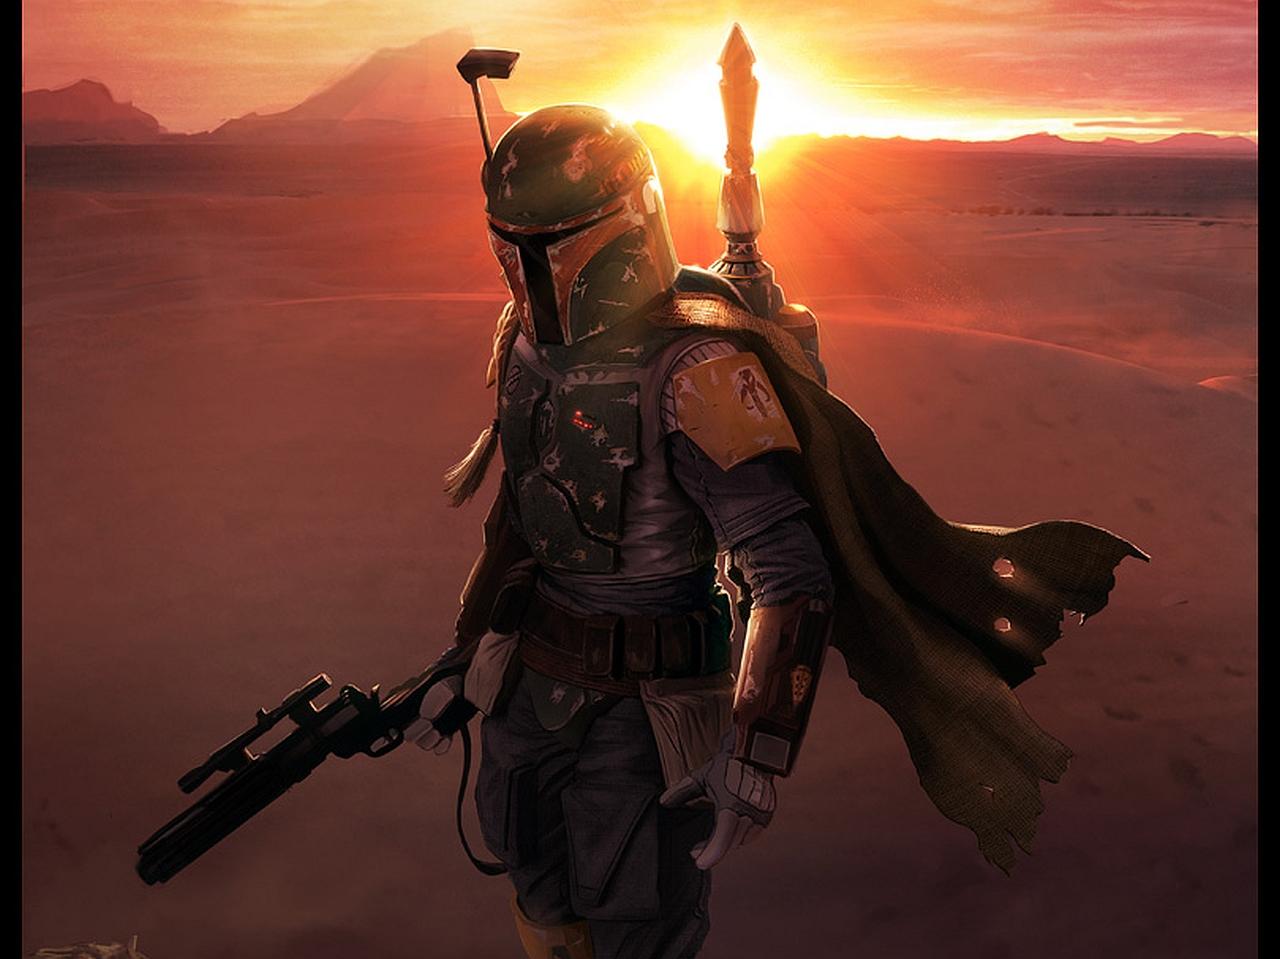 384039 Title Boba Fett Sci Fi Star Wars Wallpaper Star Wars Poster Fan Made 1280x959 Download Hd Wallpaper Wallpapertip